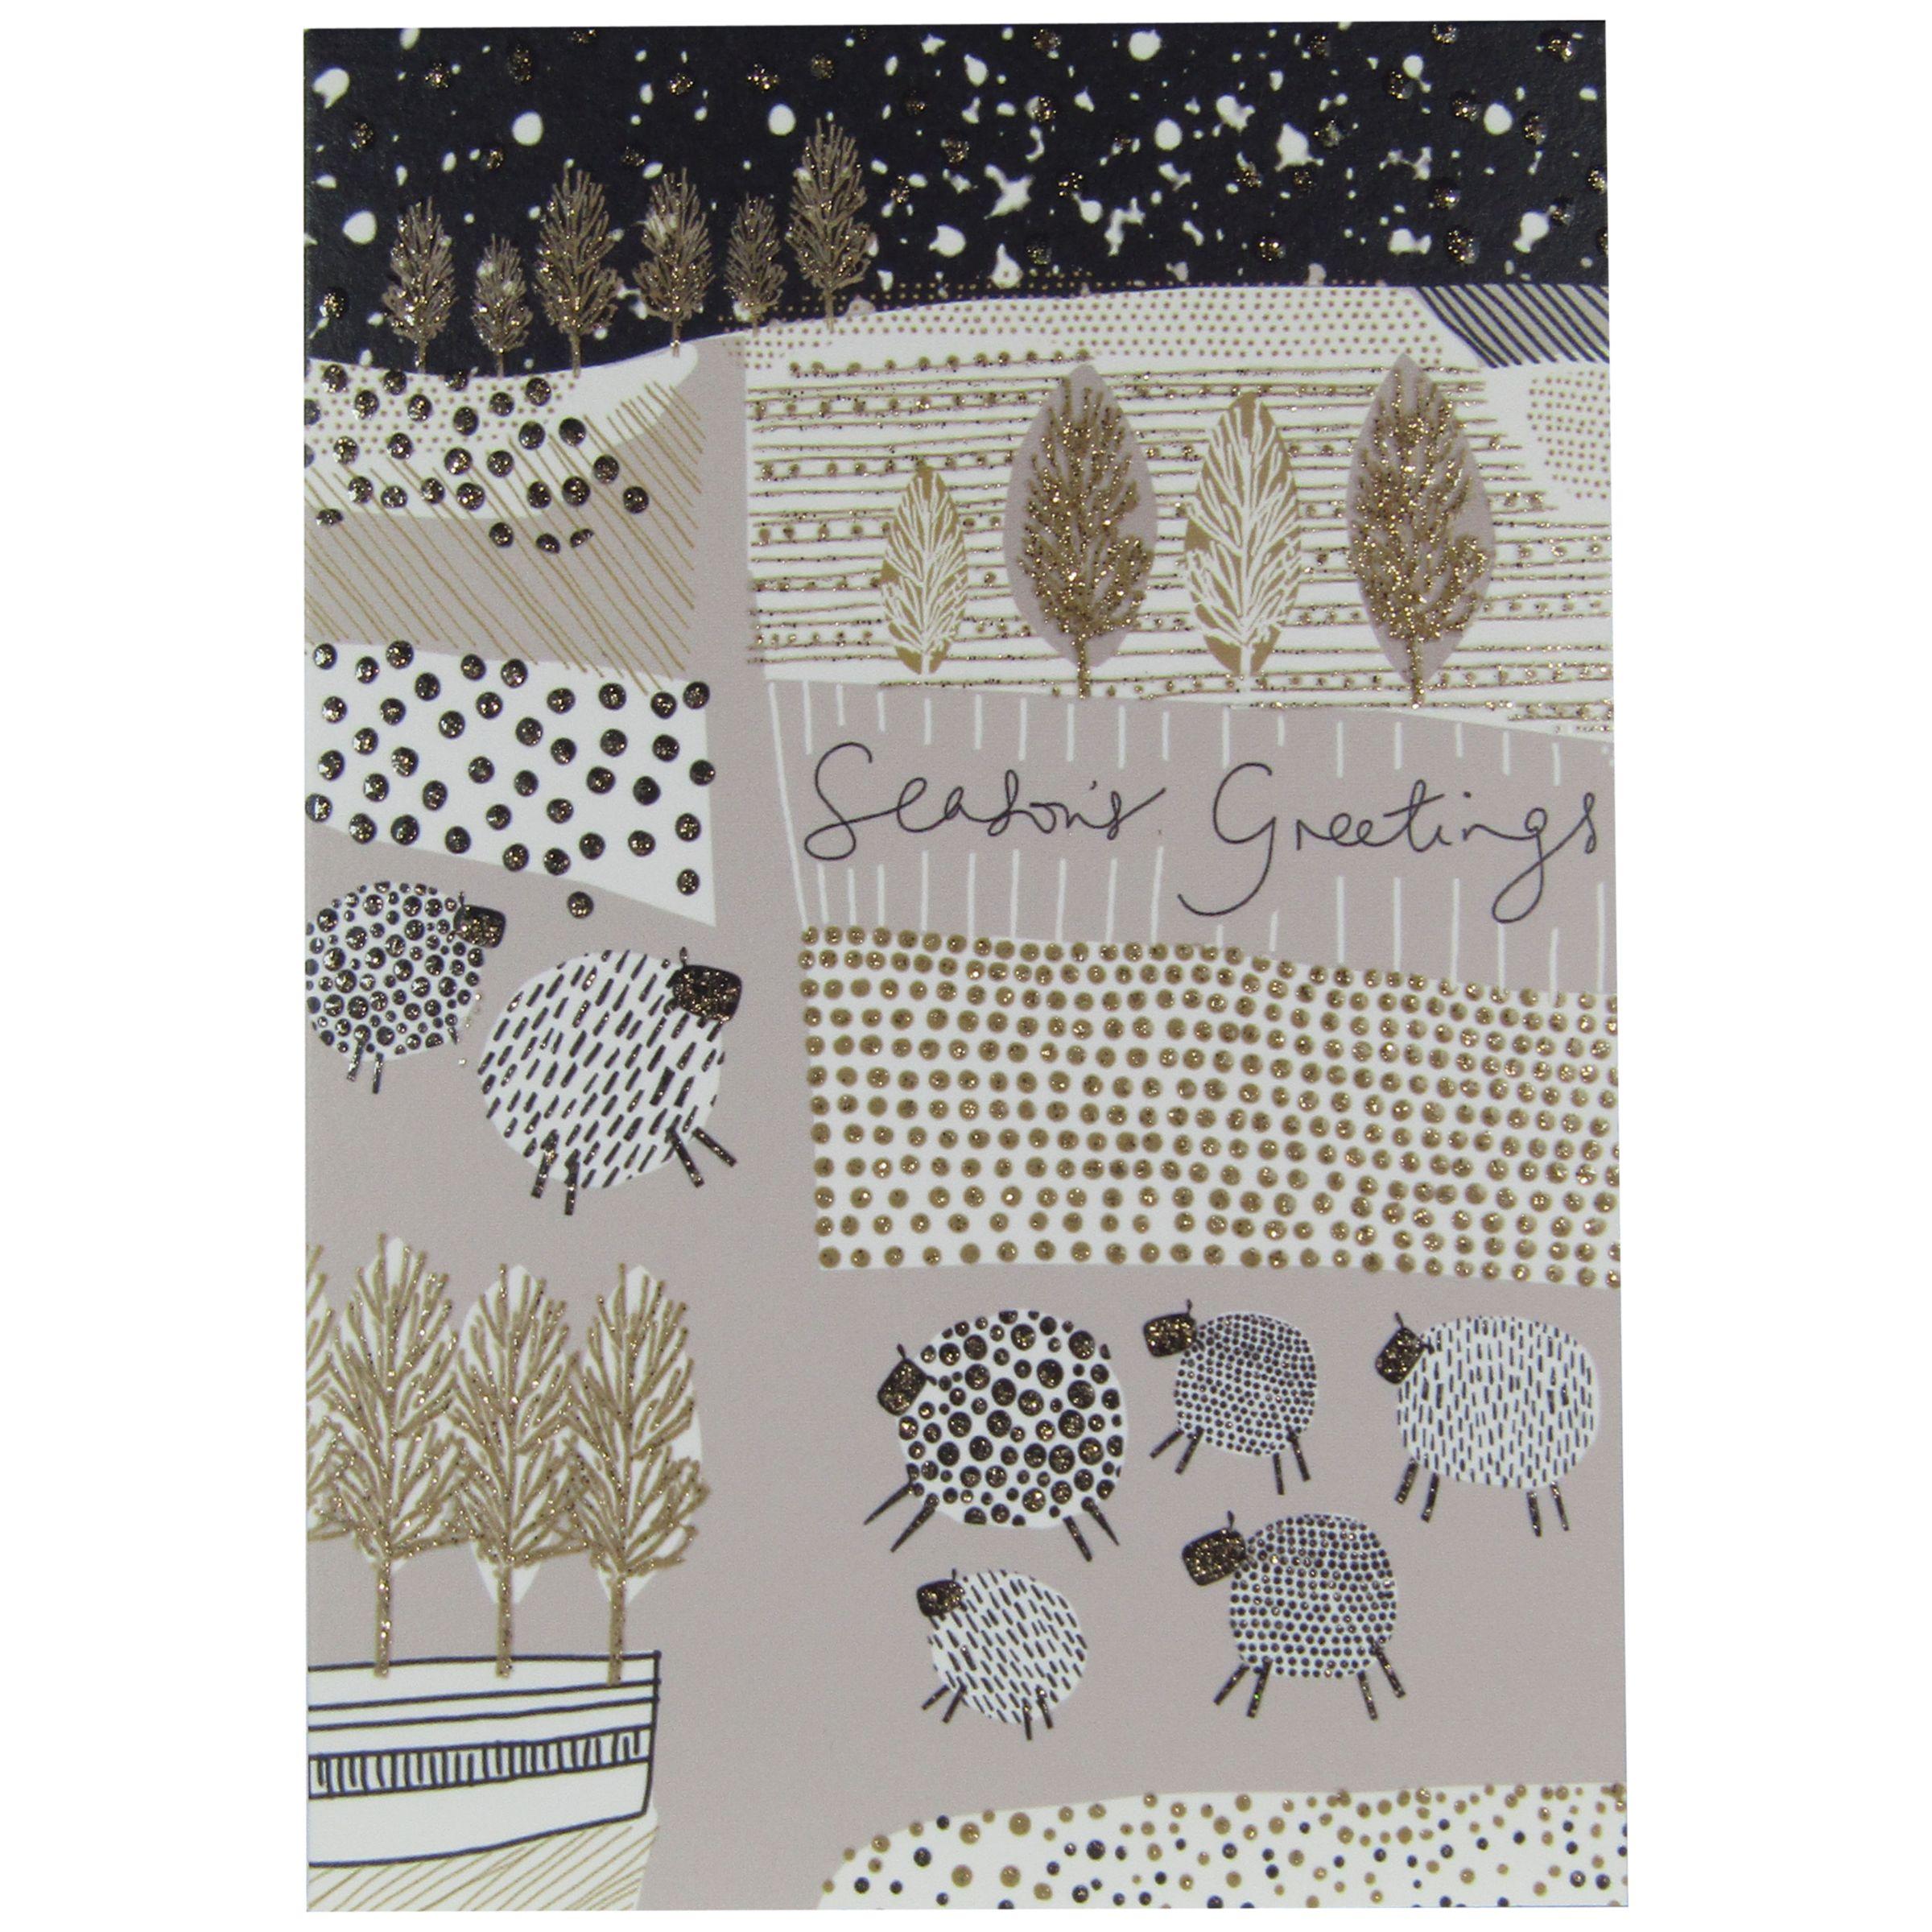 Woodmansterne Woodmansterne Fields Of Joy Charity Christmas Cards, Pack of 5